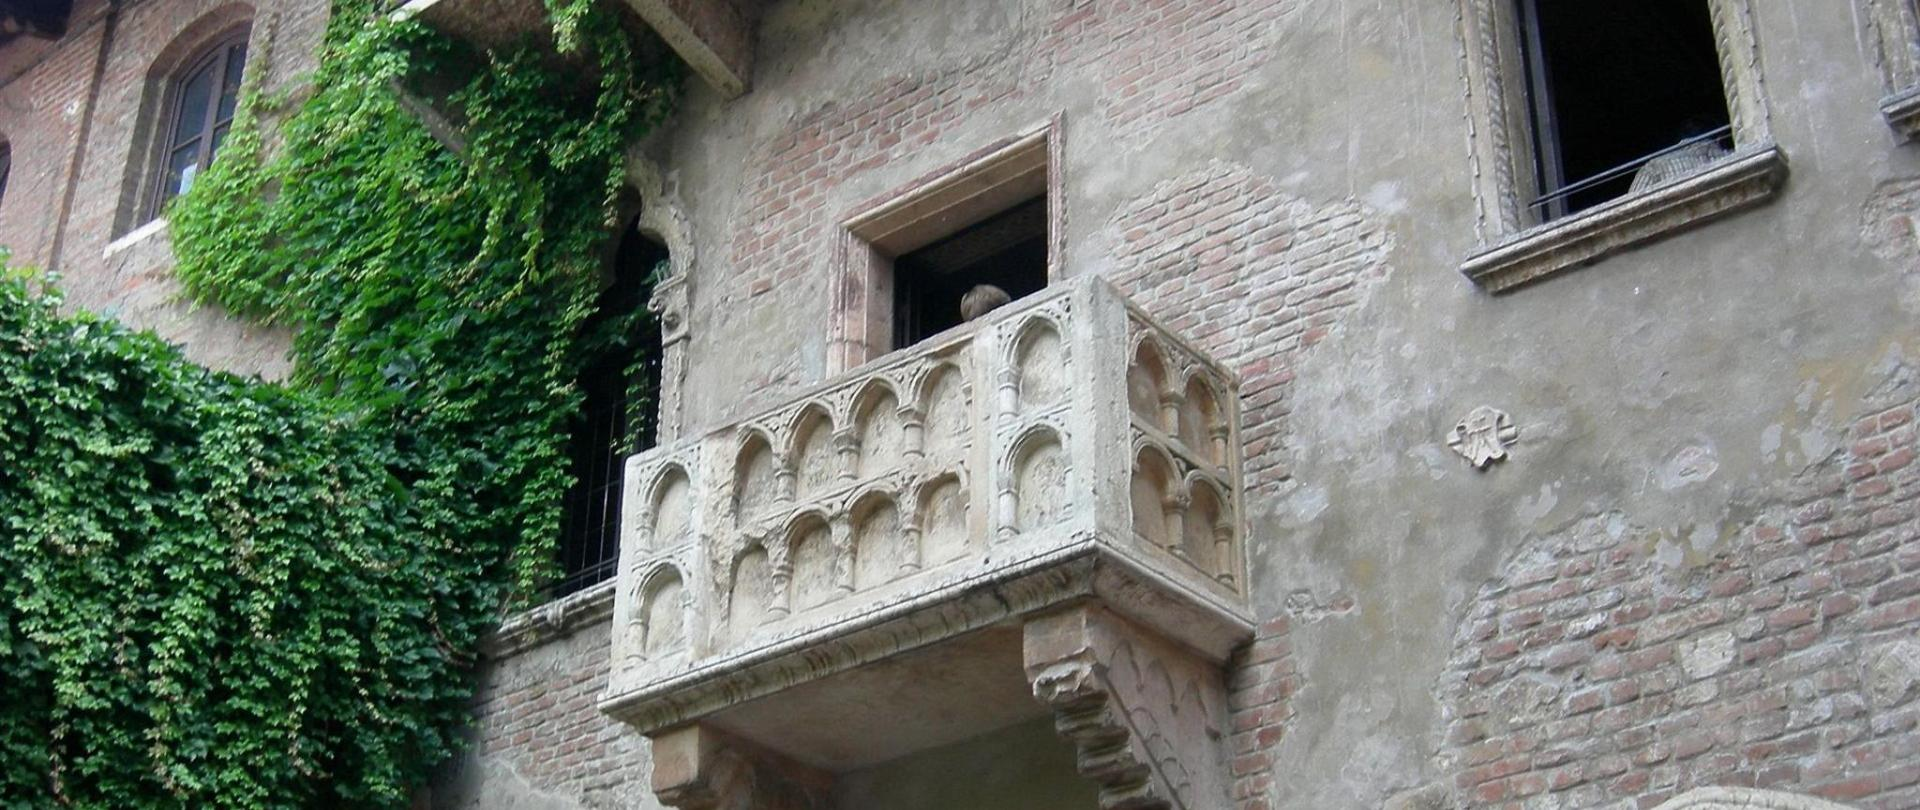 casa_di_giulietta_-verona-_-_balcony.jpg